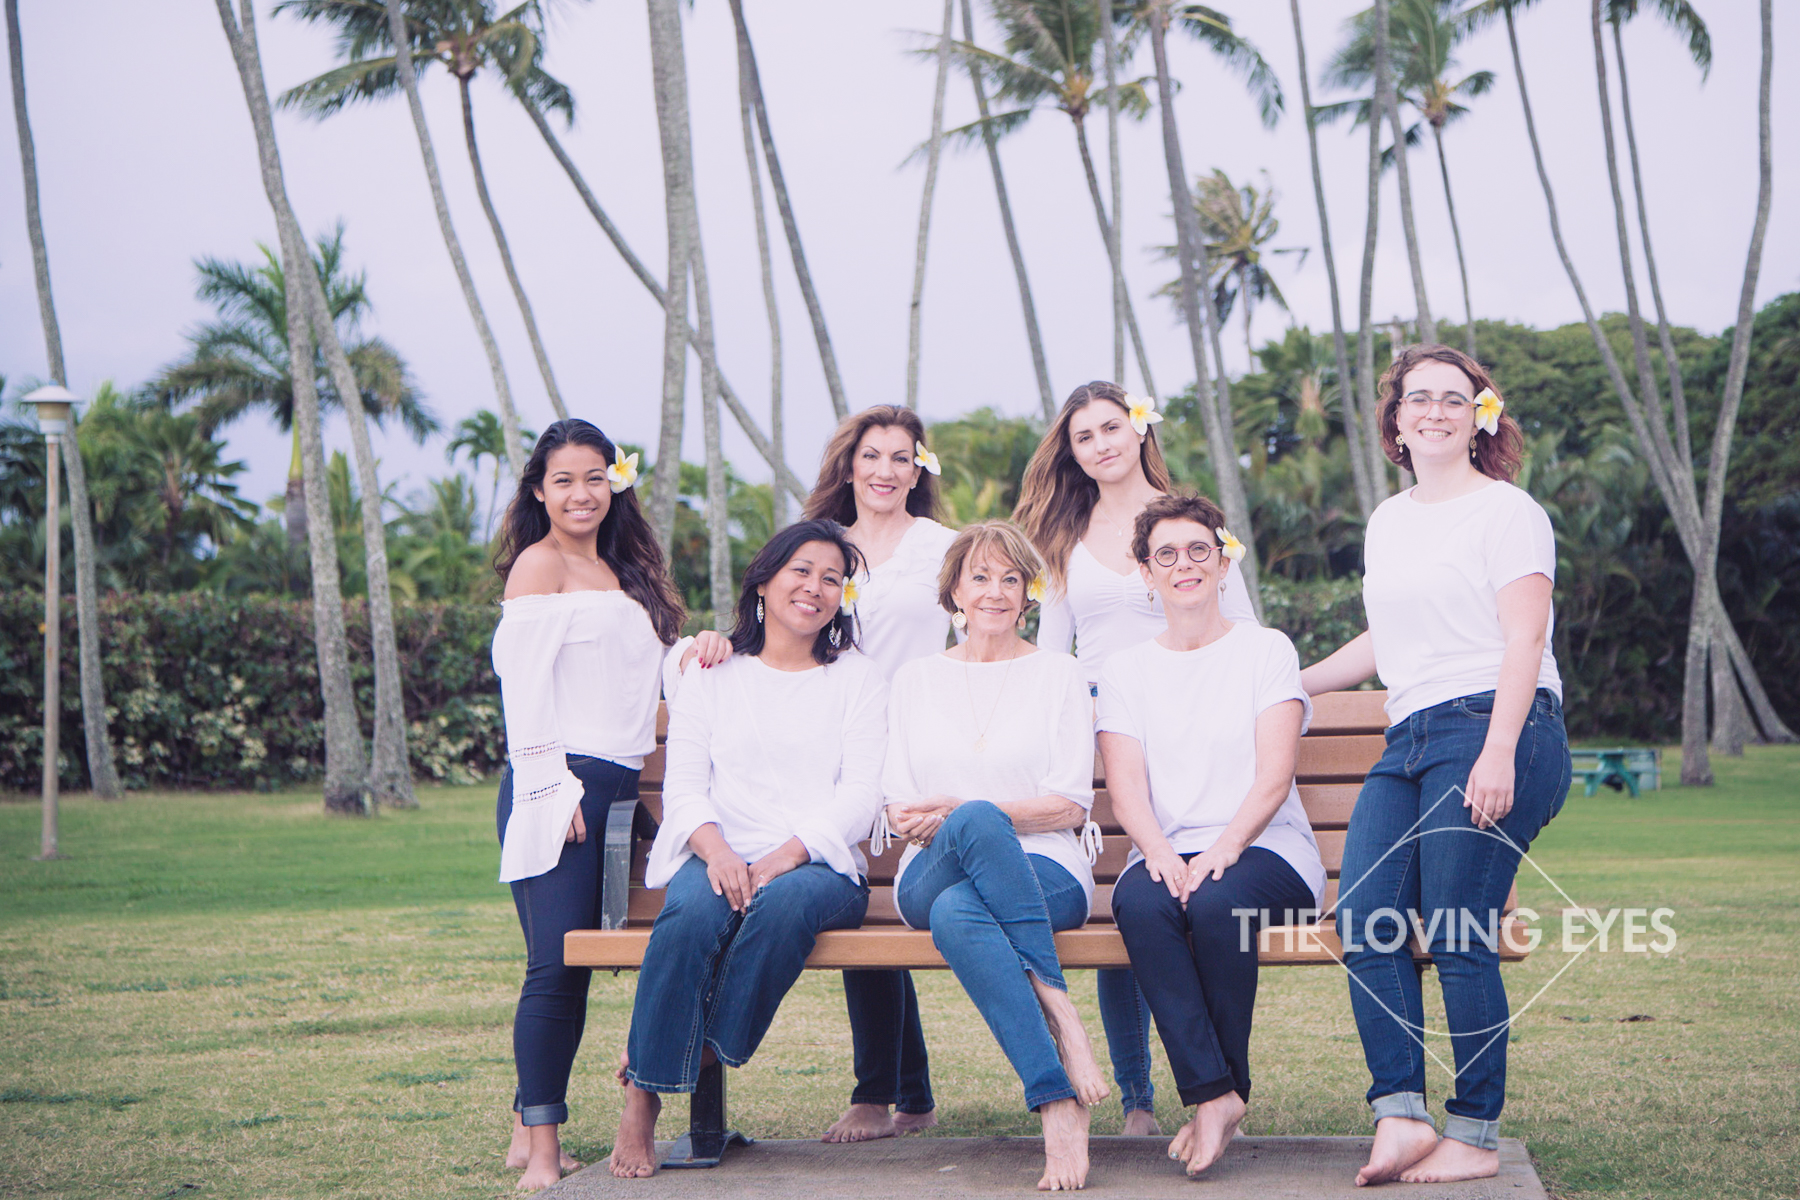 Family portrait at Waialae Beach Park in Hawaii